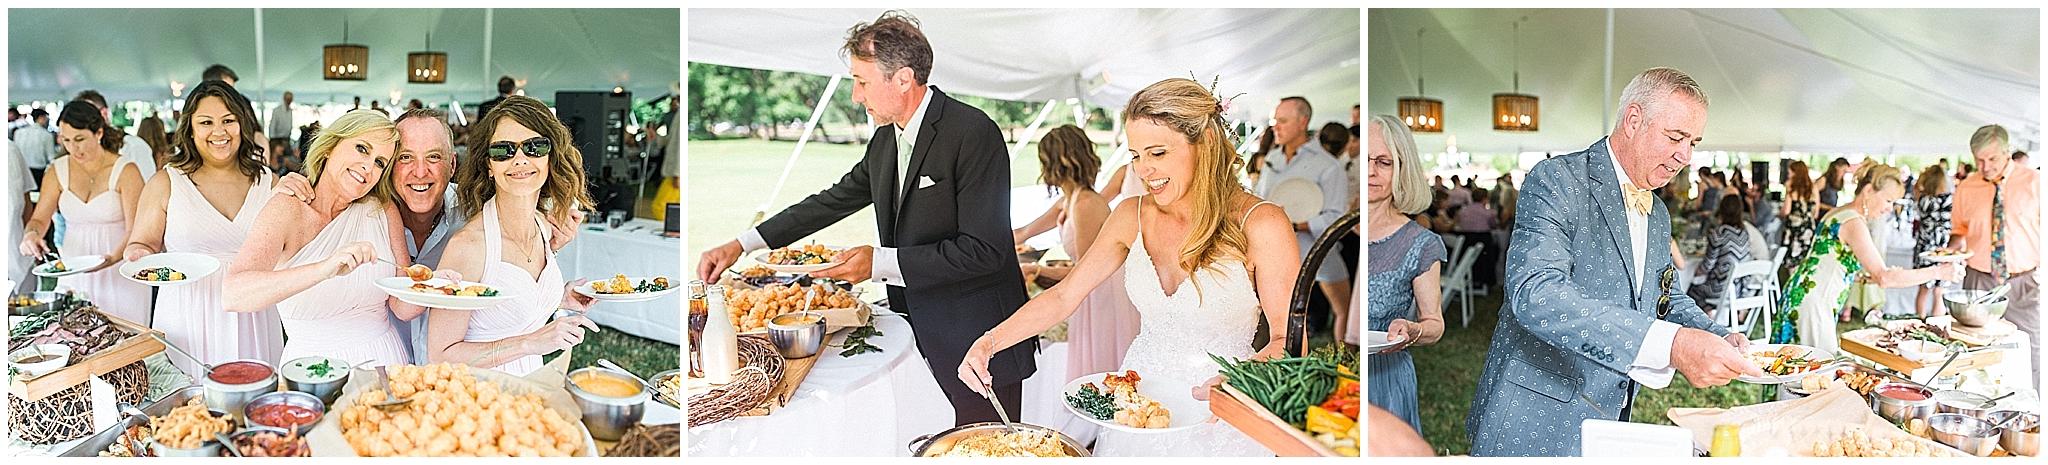 Wedding_Asheville_Photography_Junebug_Retro_Resort_10.jpg